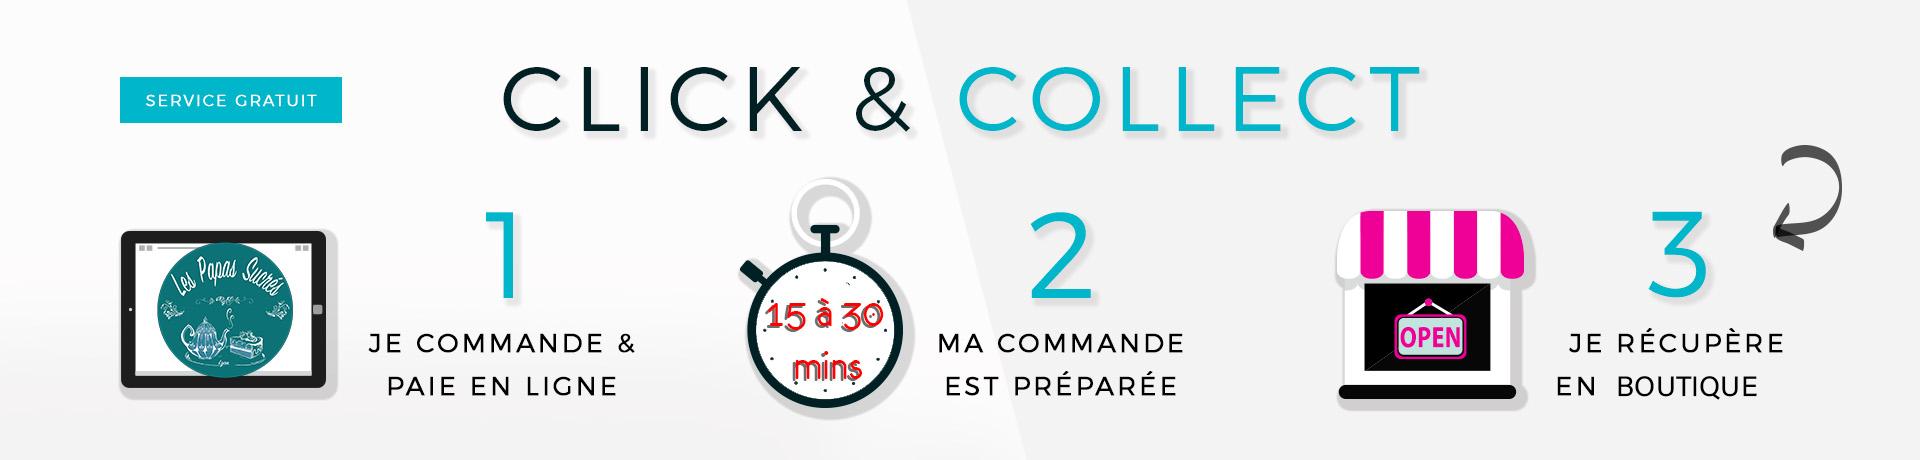 restaurant Click and collect à lyon